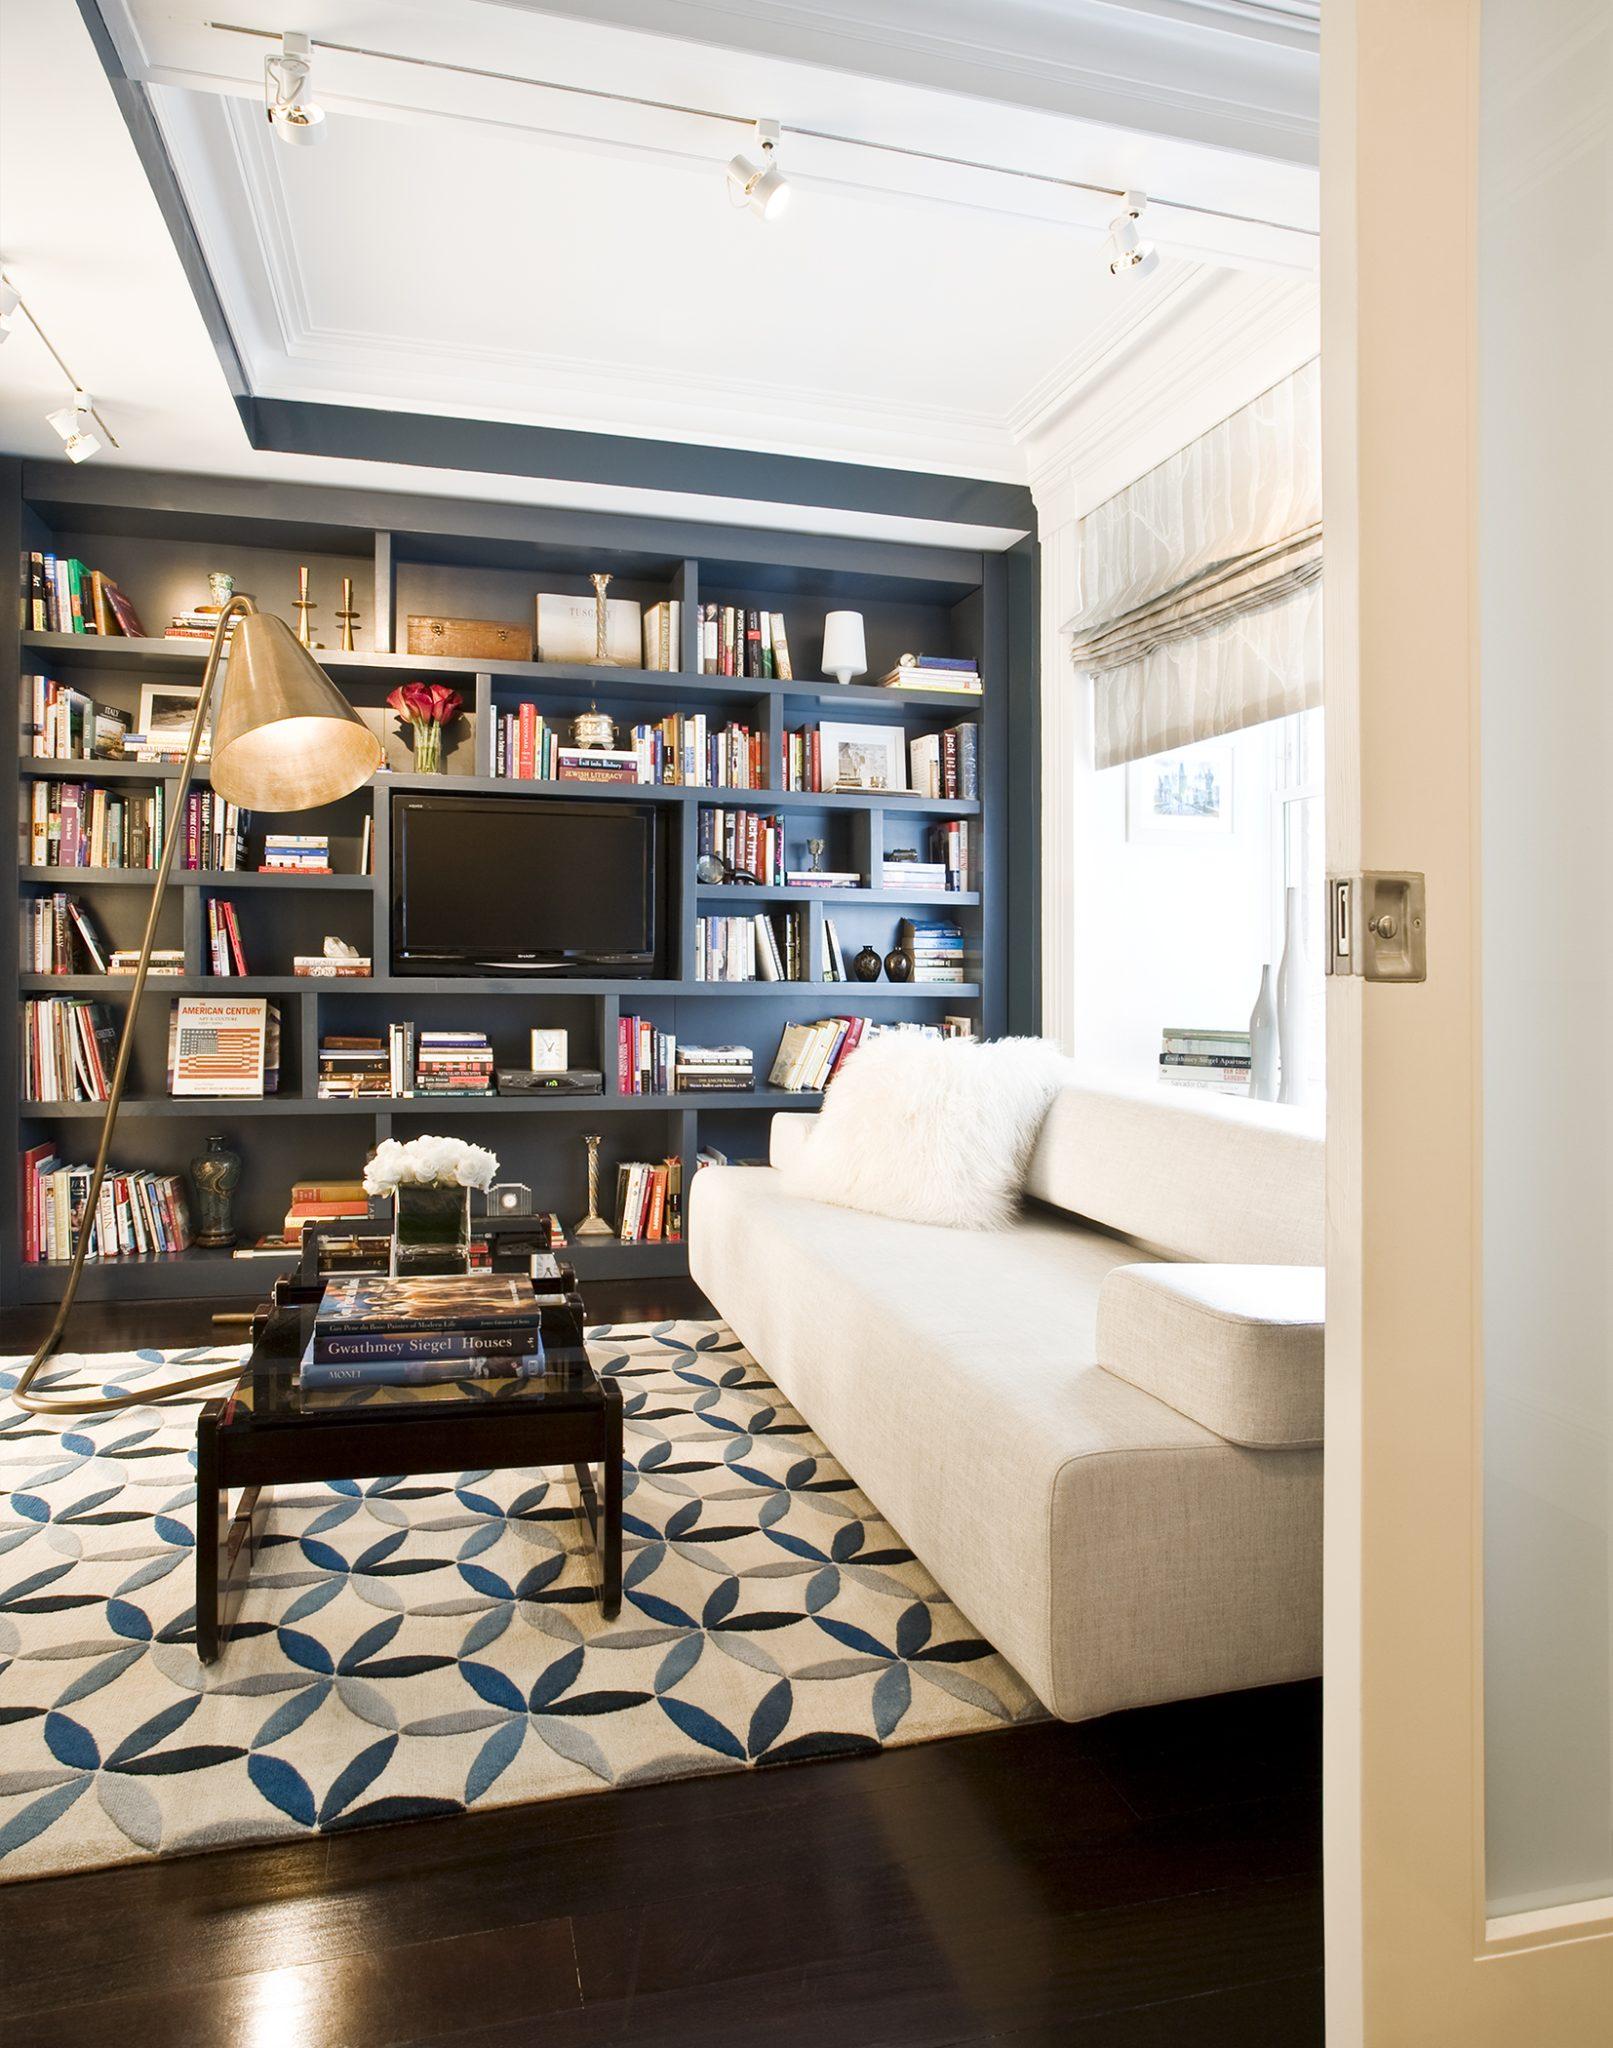 Interior design byDaun Curry